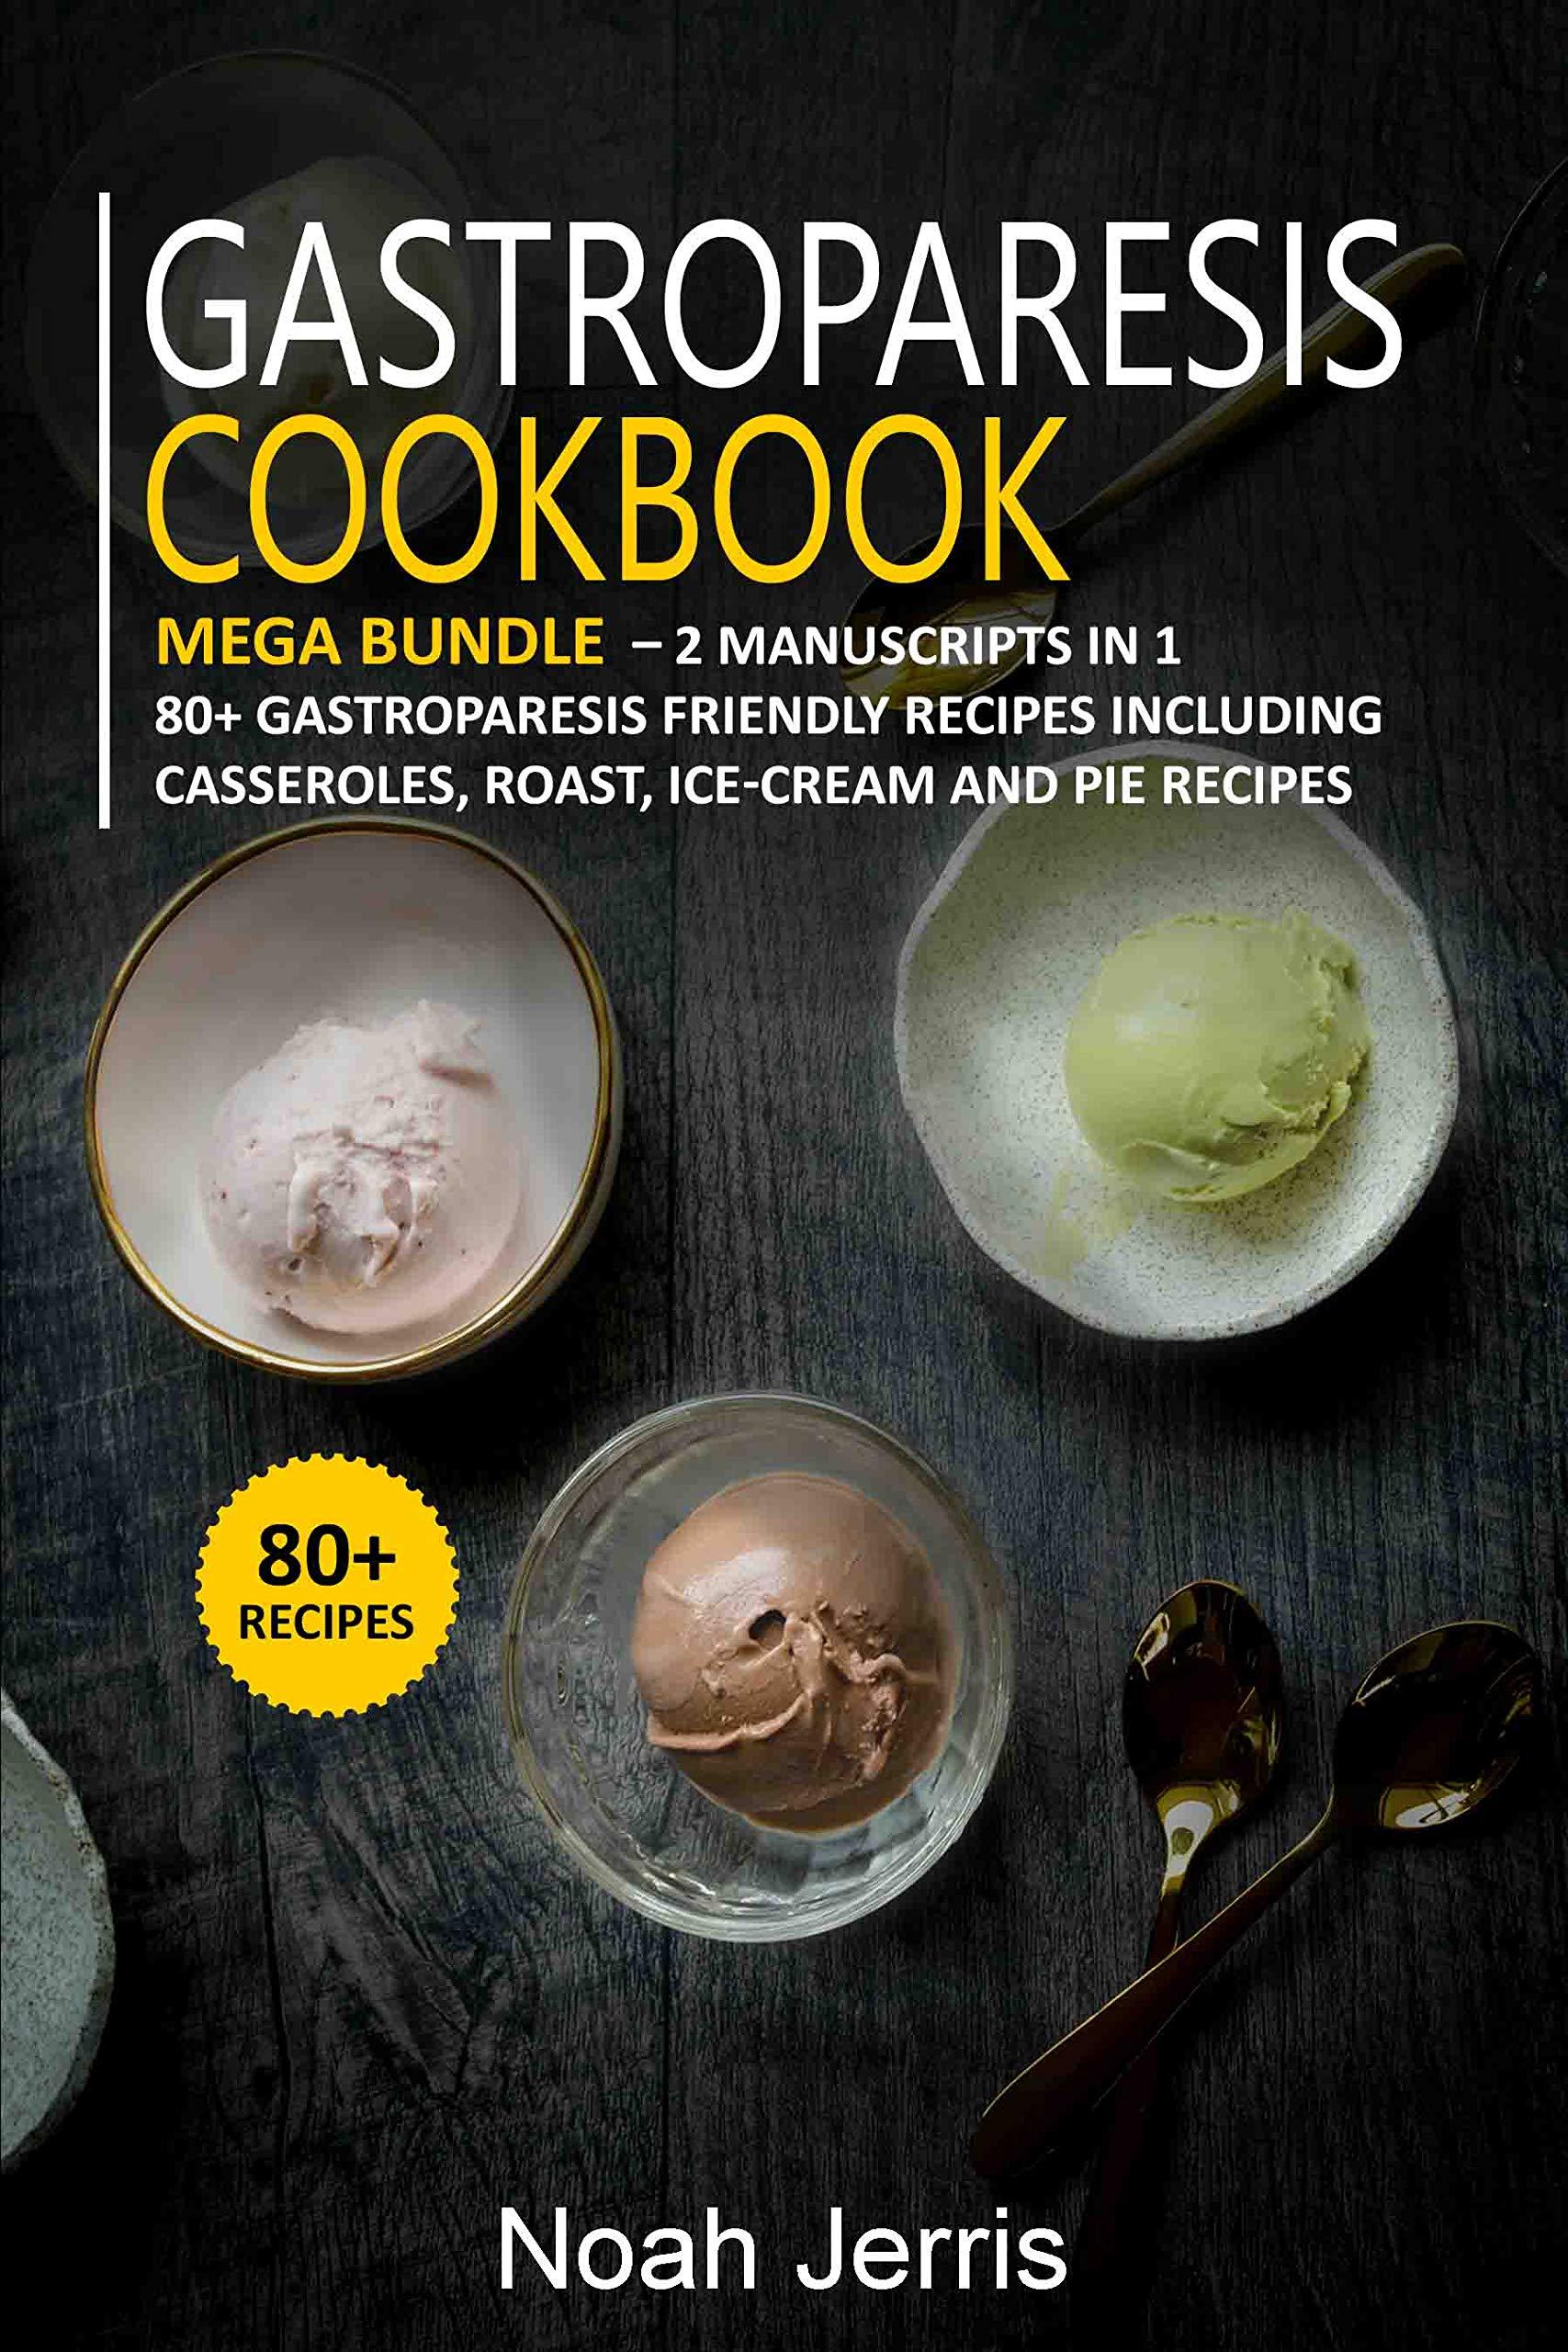 GASTROPARESIS COOKBOOK: MEGA BUNDLE – 2 Manuscripts in 1 – 80+ Gastroparesis - friendly recipes including casseroles, roast, ice-cream and pie recipes